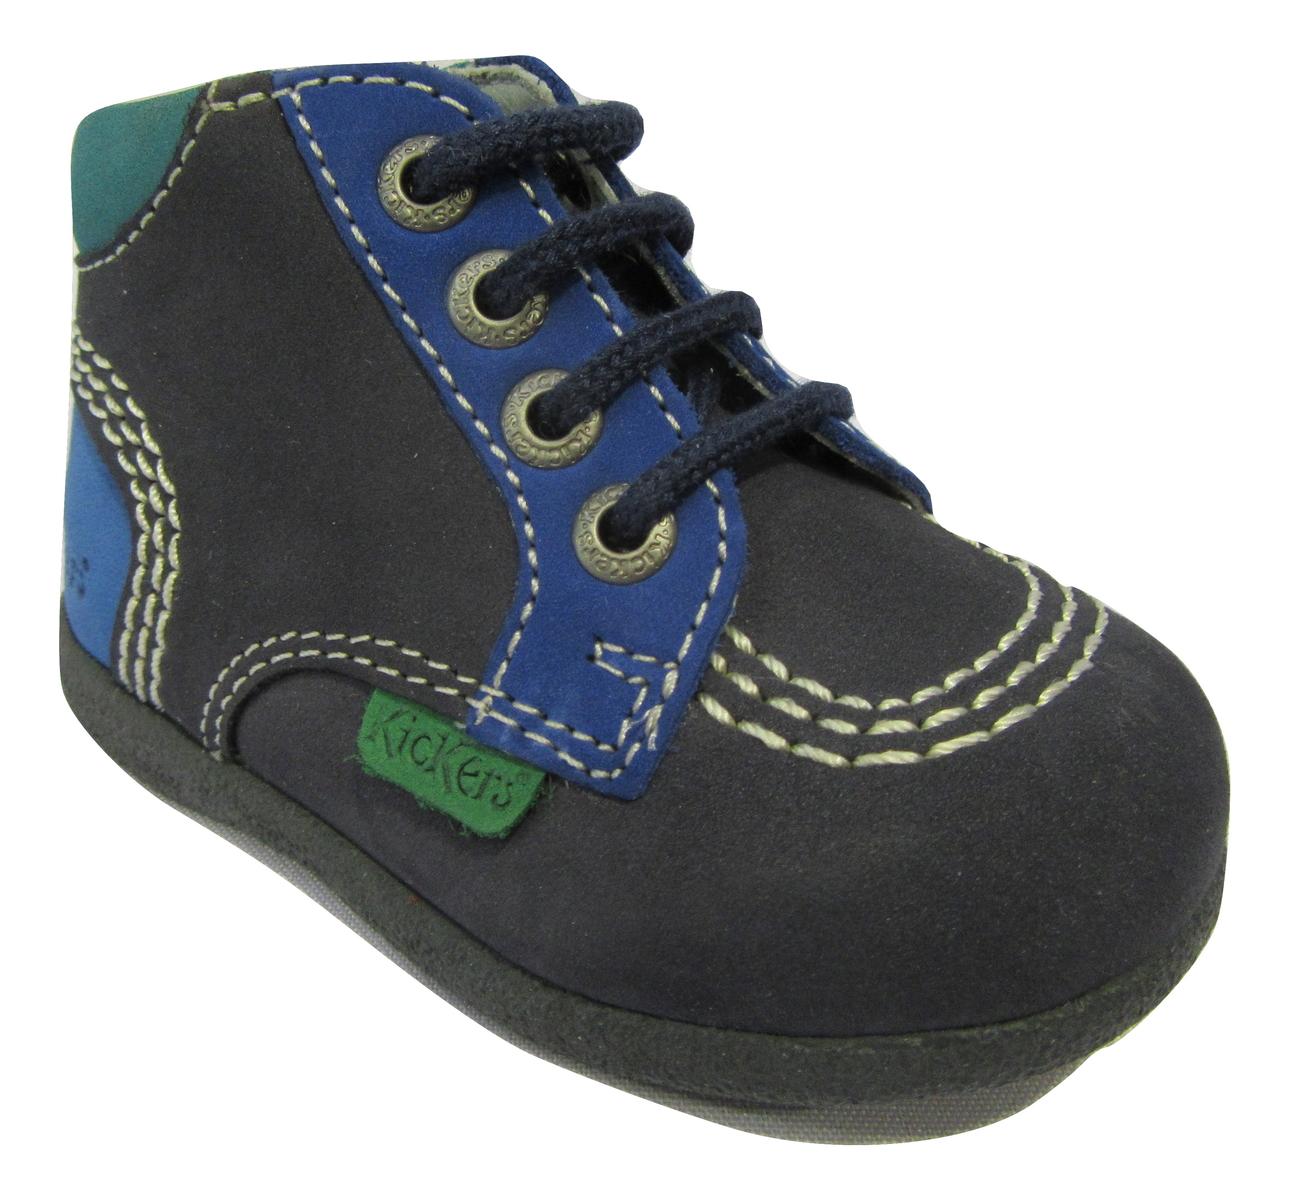 Chaussure premiers pas KICKERS en cuir bleu